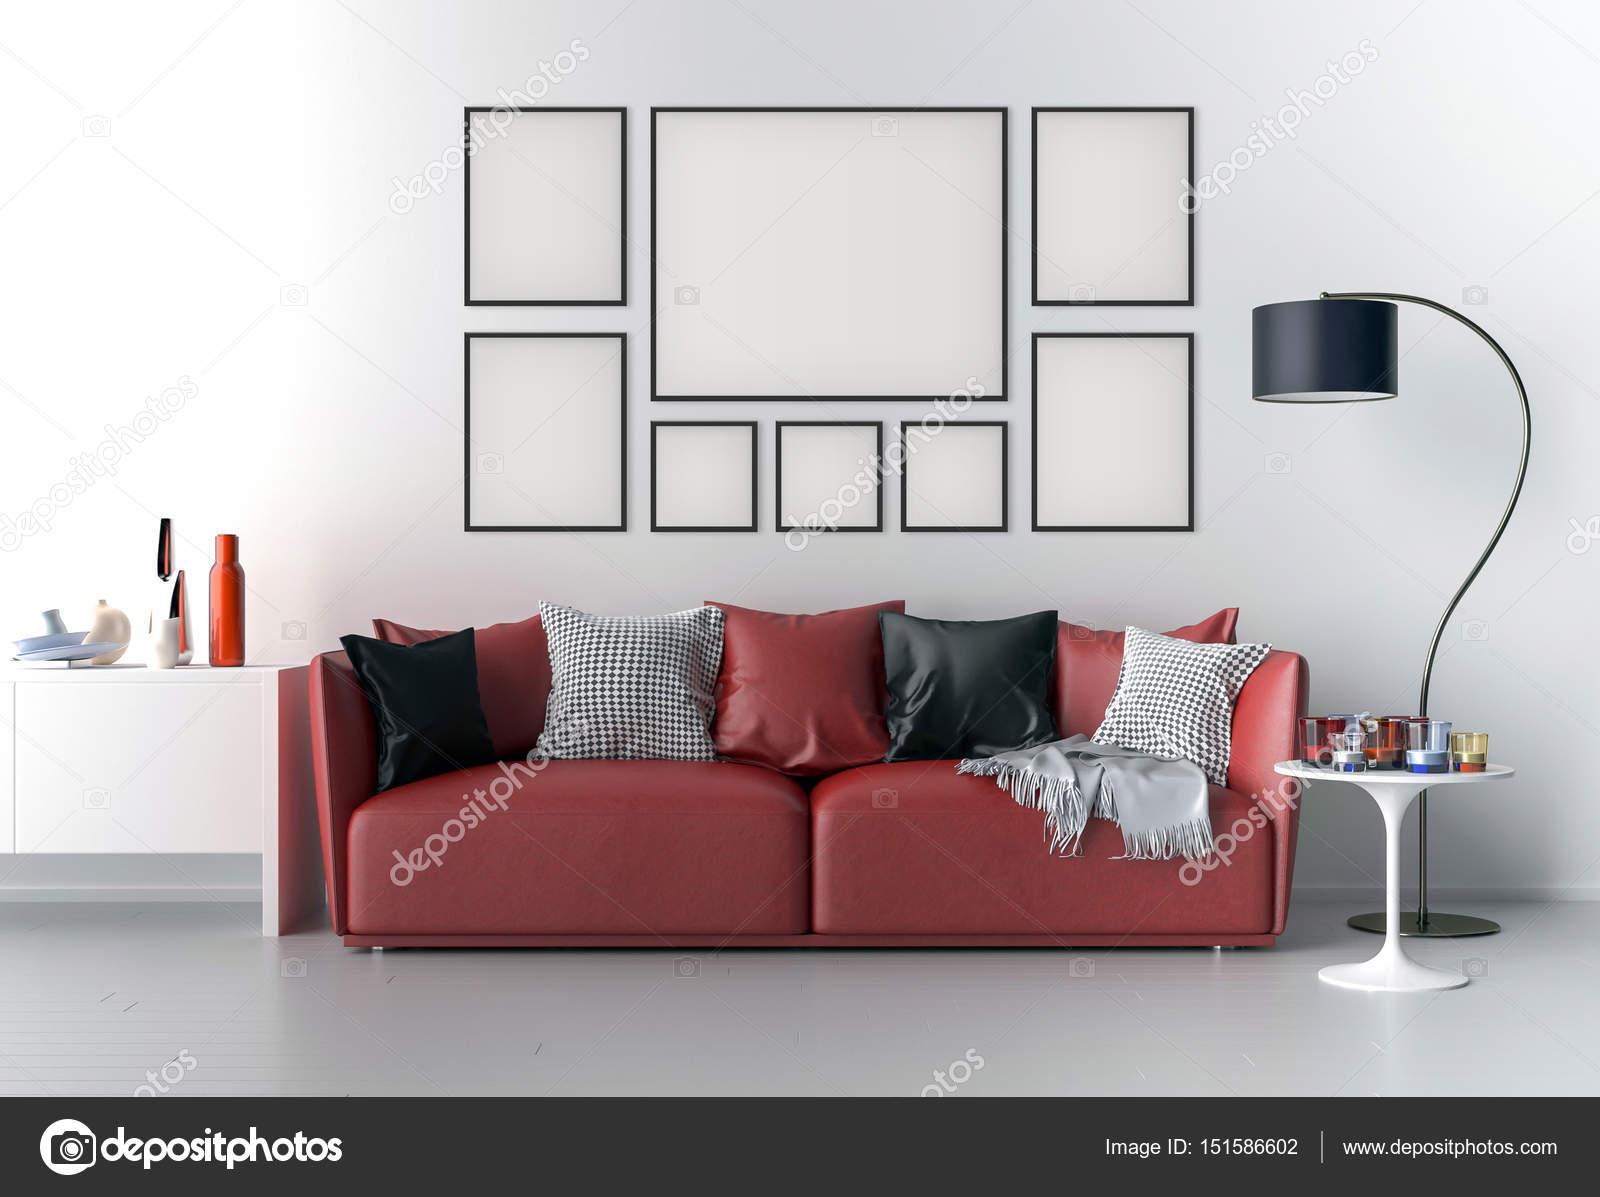 Bild Rahmen innen gesetzt Mock-up — Stockfoto © pozitivo #151586602